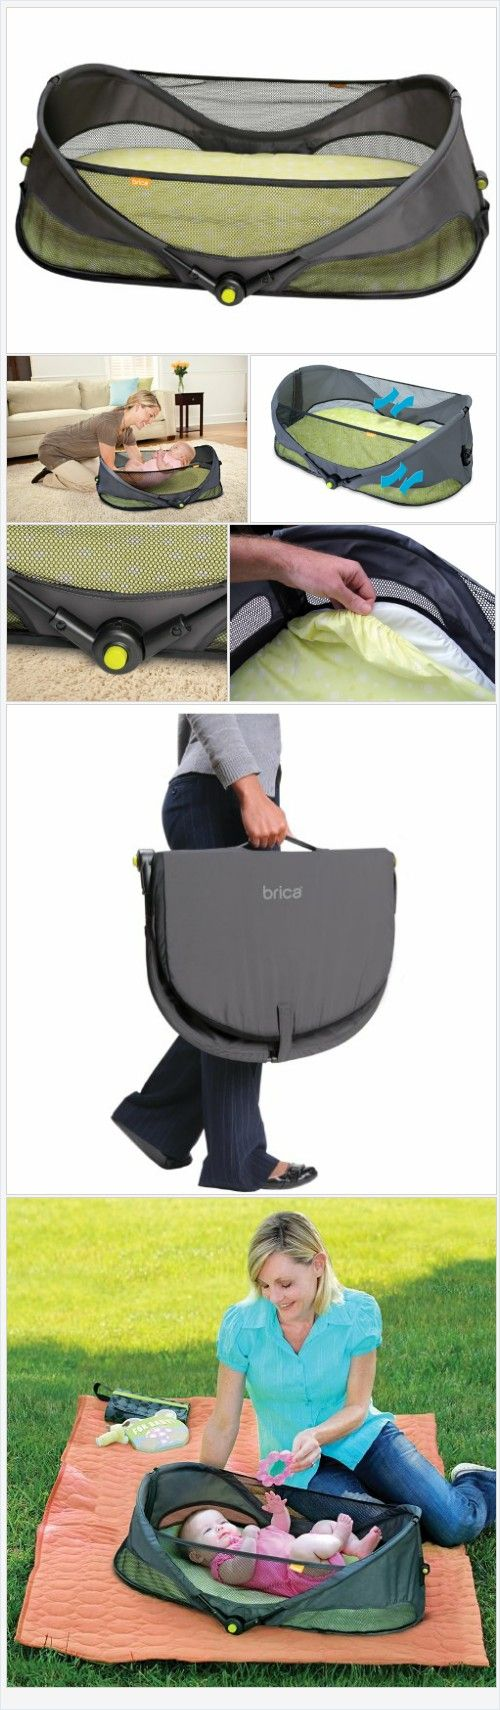 BRICA Fold N' Go Travel Bassinet - Every Thing Baby